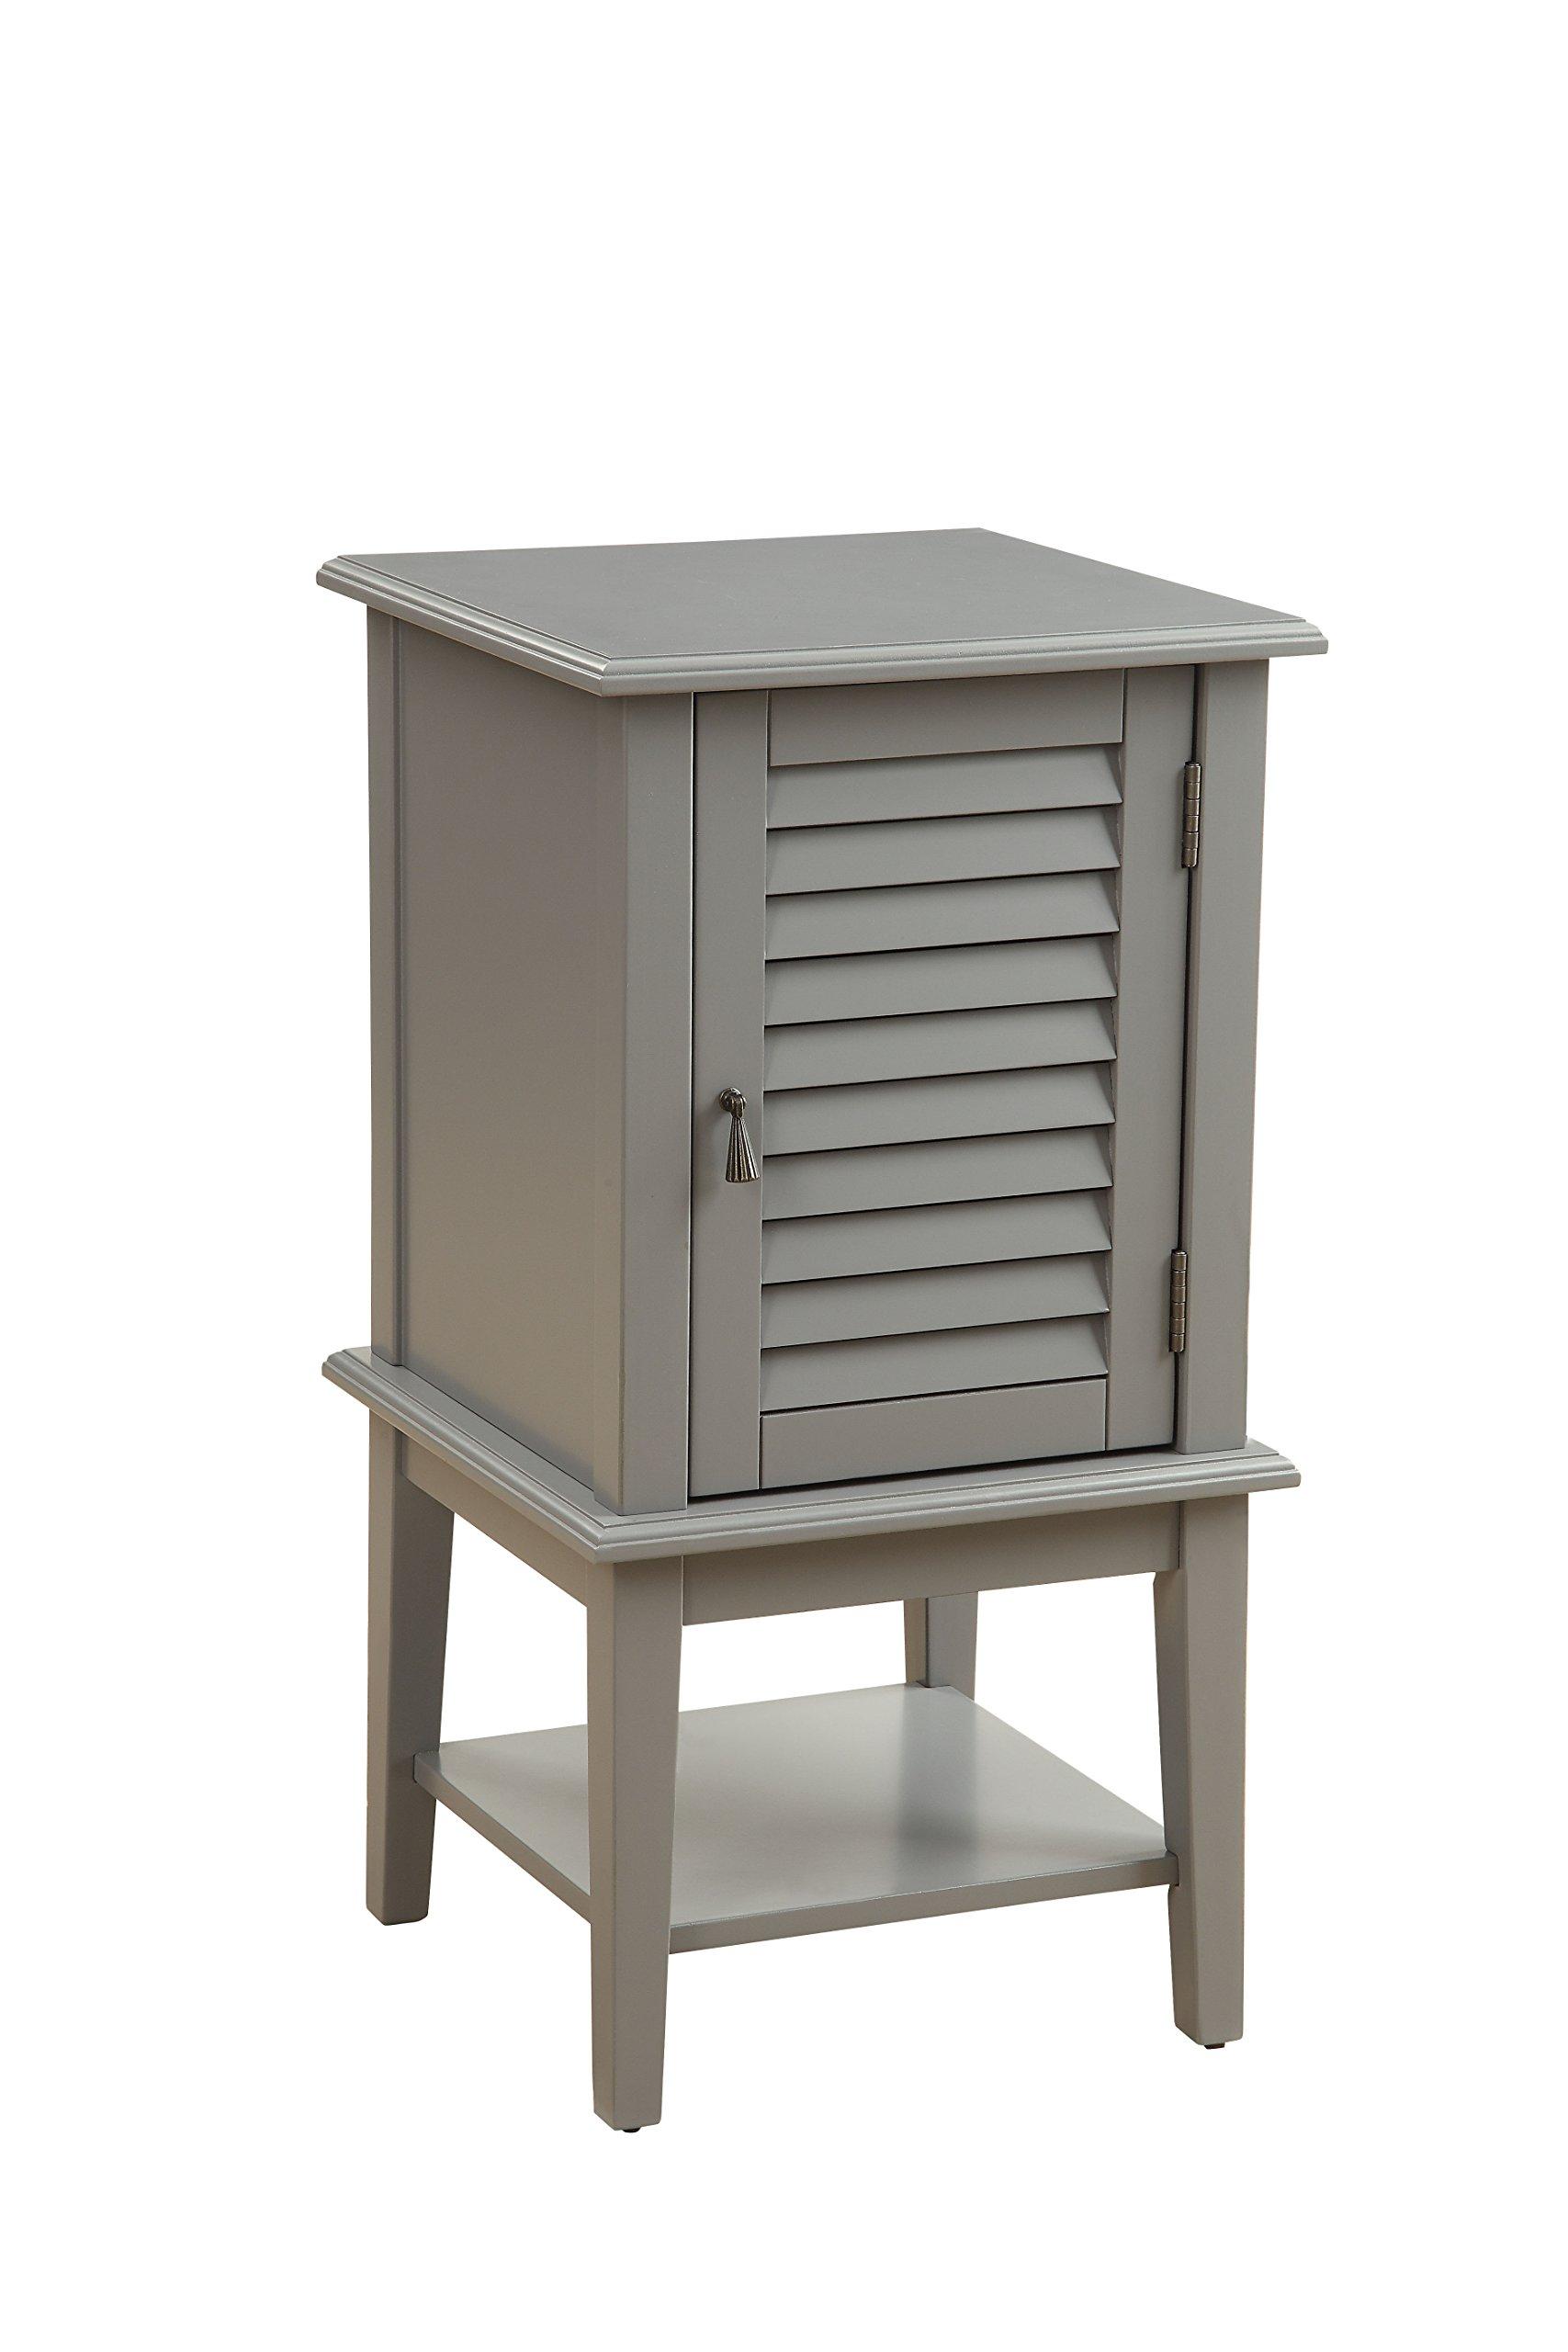 Acme Furniture Acme 97358 Hilda II Floor Cabinet, Gray, One Size